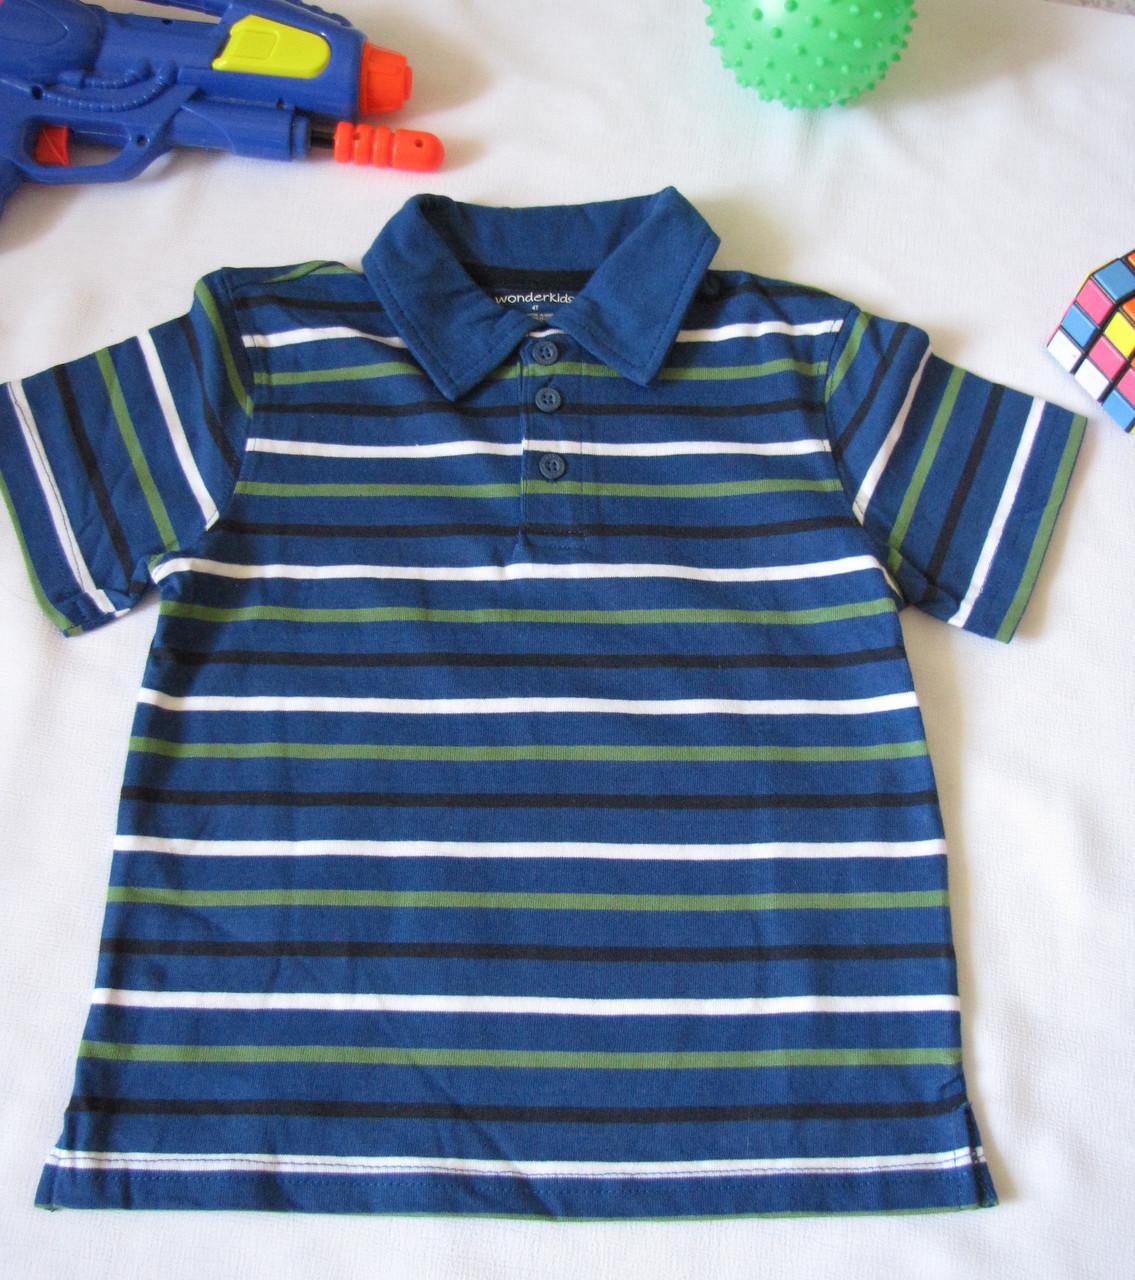 Футболка поло Wonder Kids оригинал рост 110 см синяя 07123/02